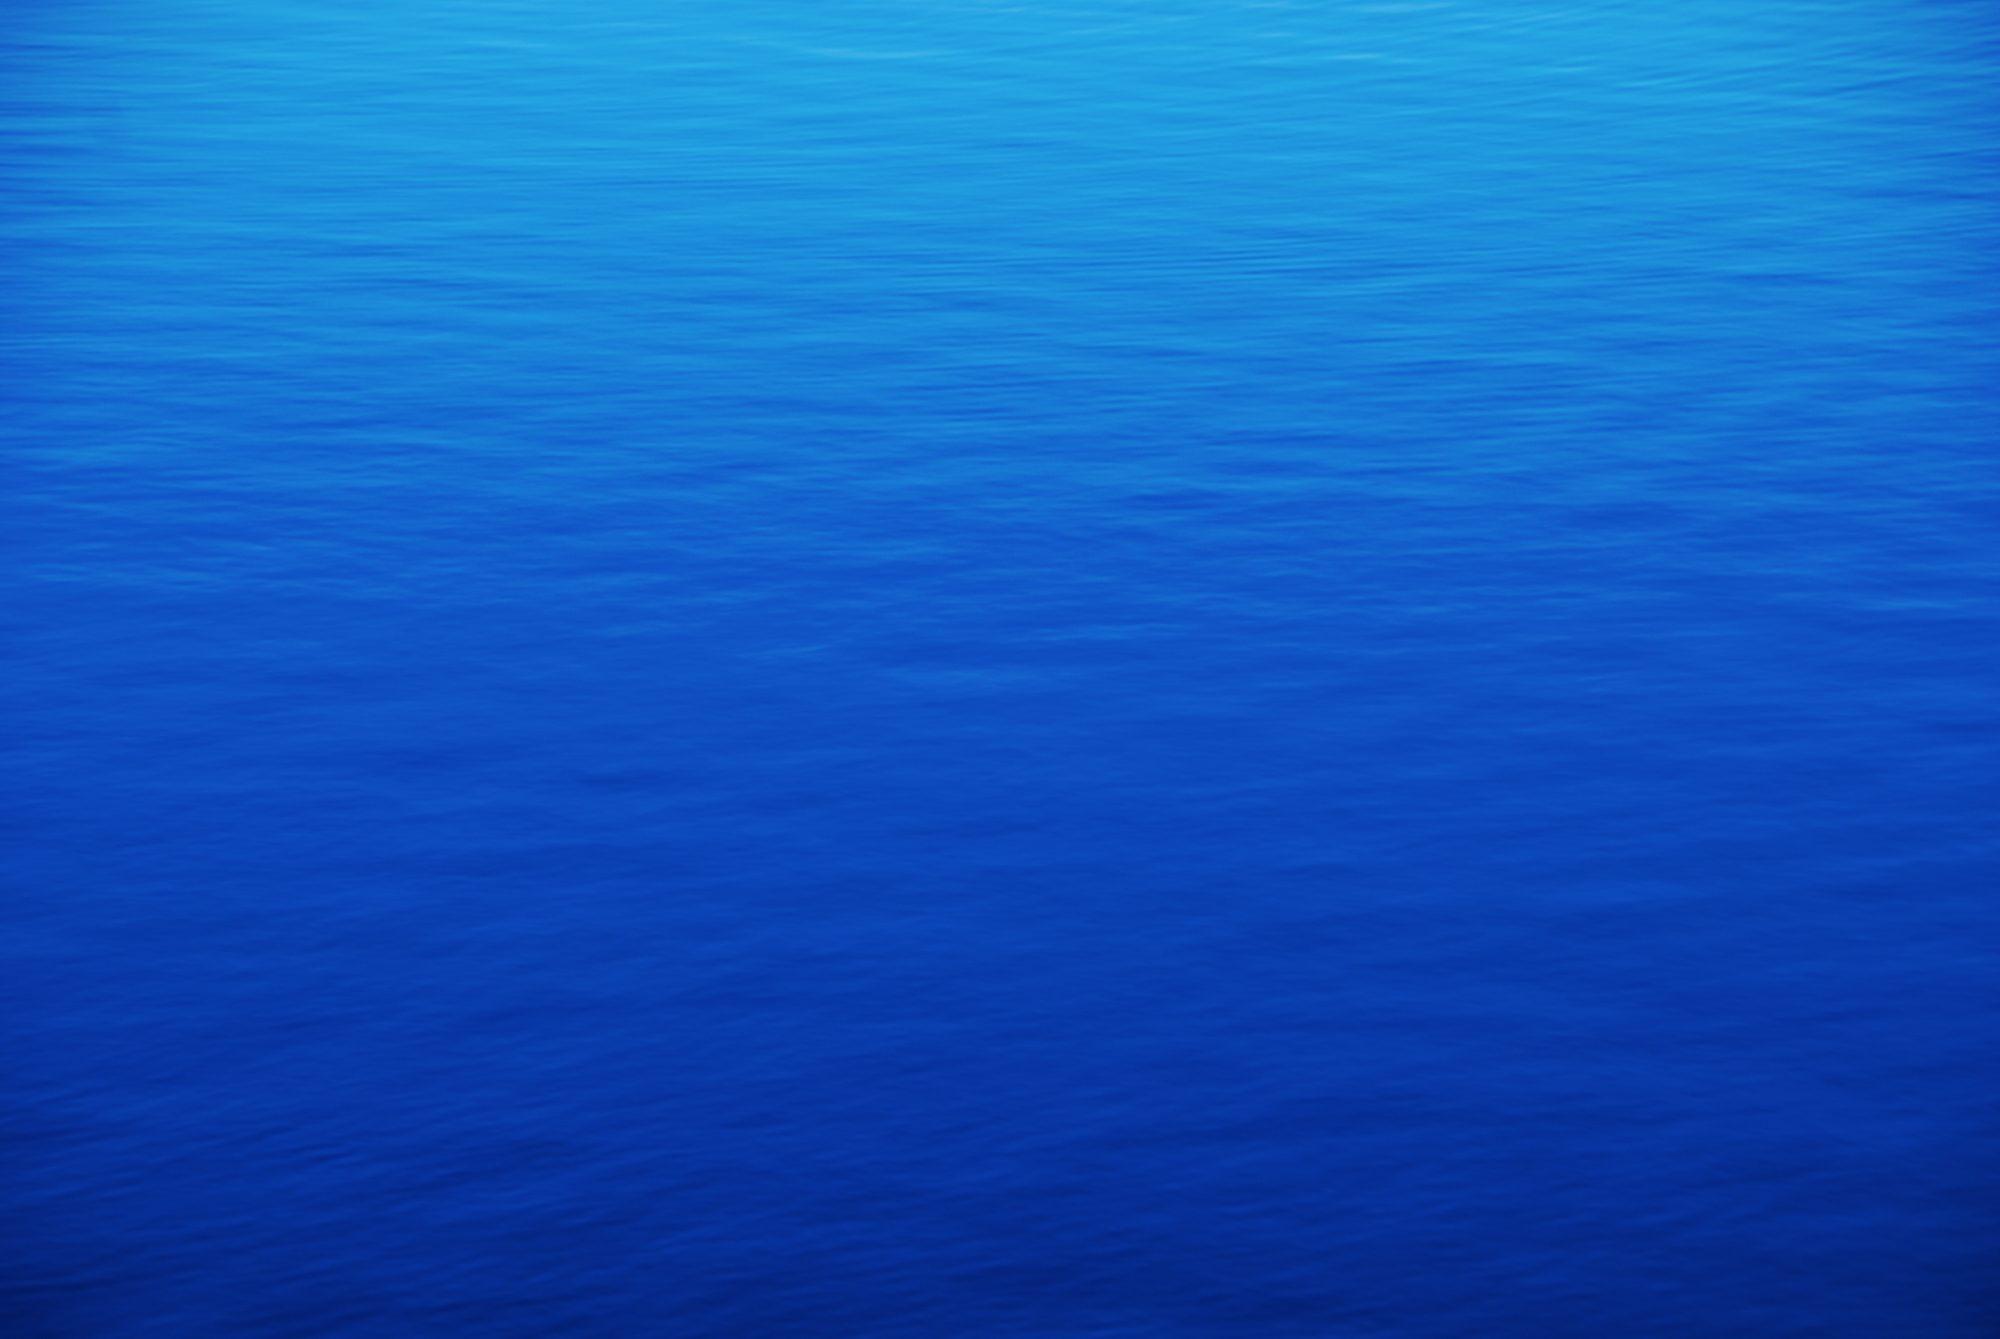 One sea - Autonomous maritime ecosystem